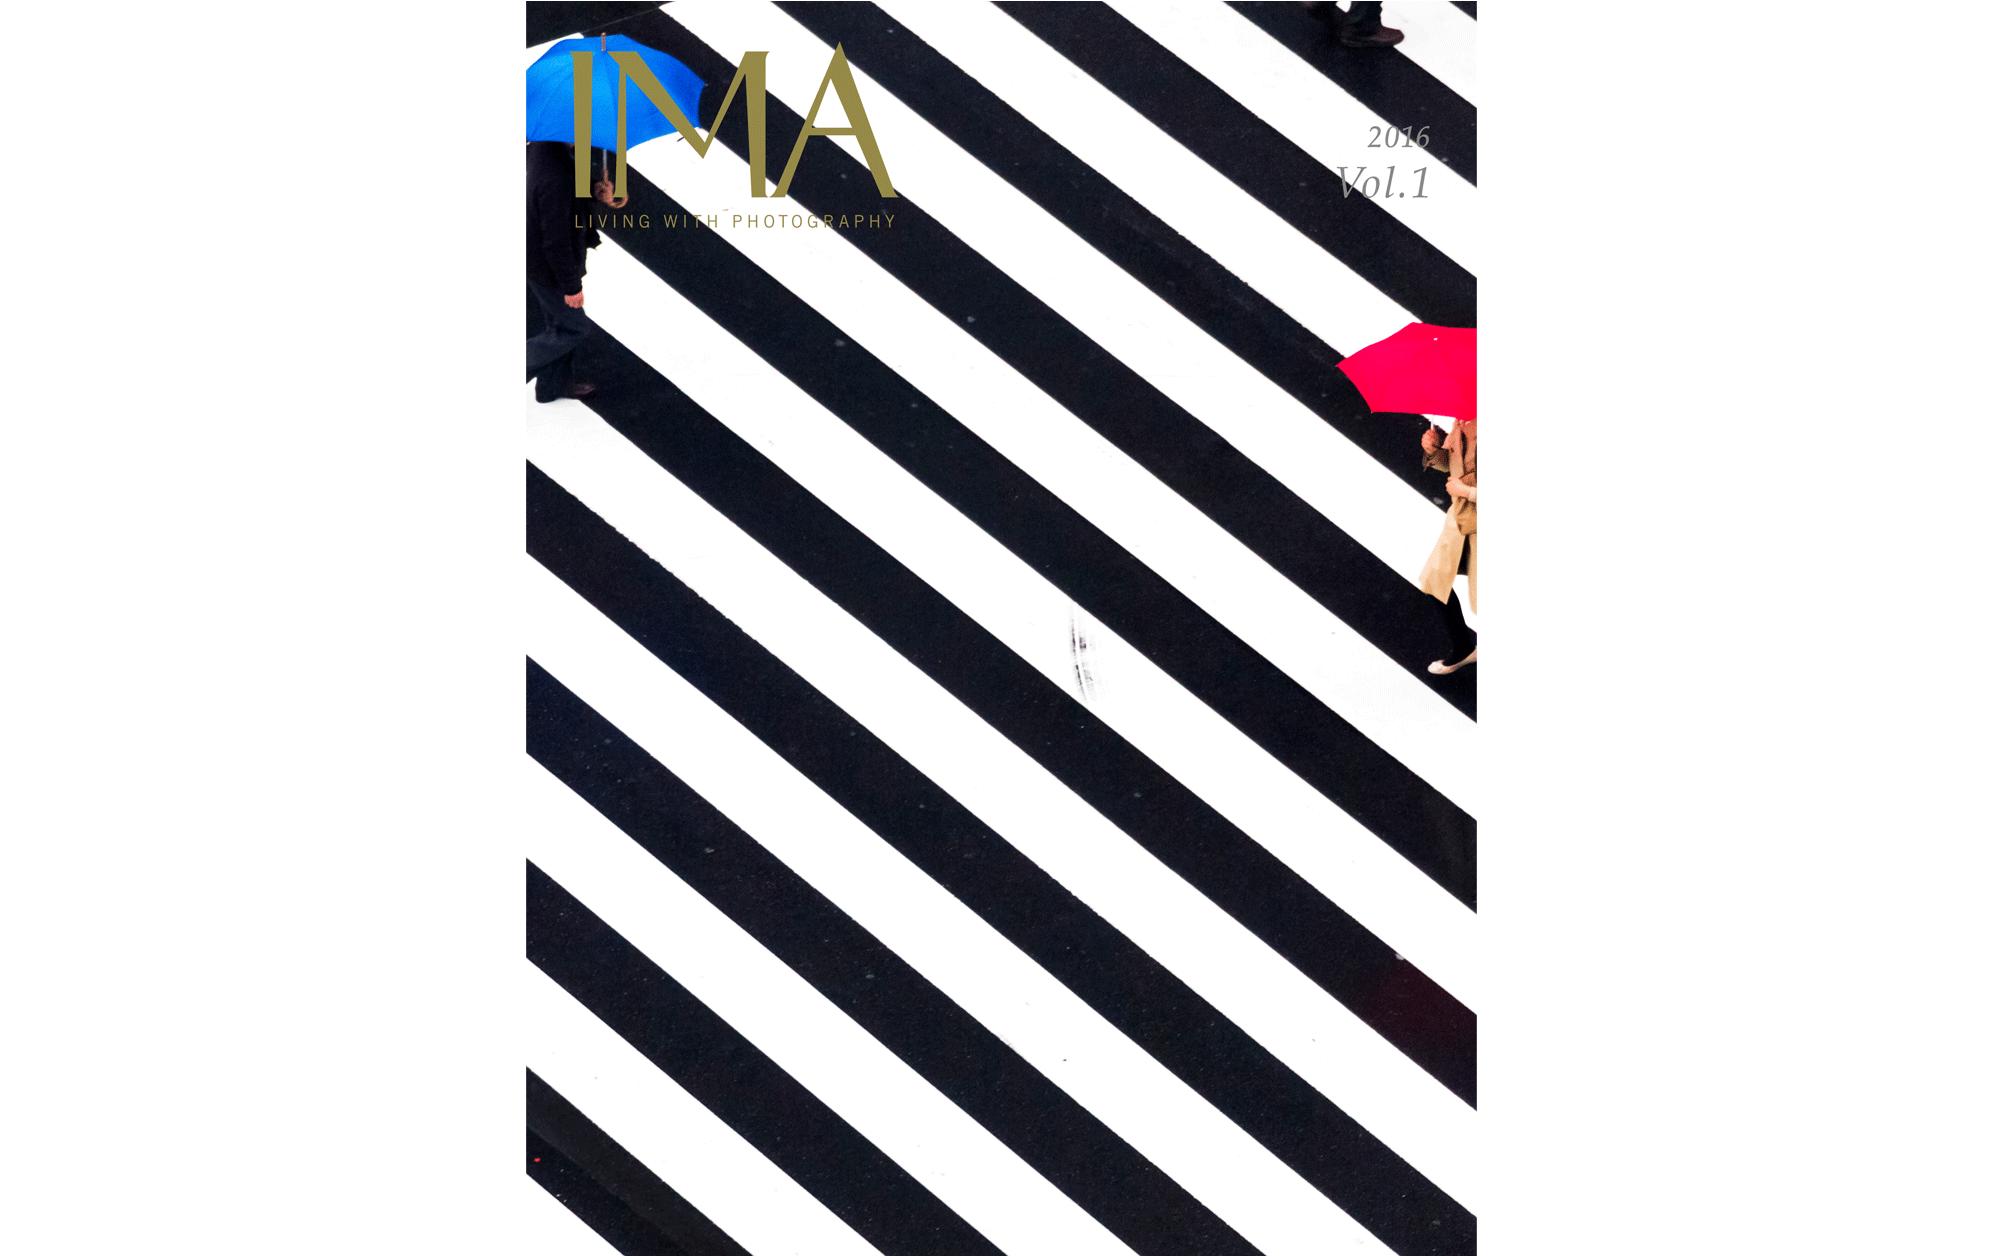 IMA English edition Vol.1